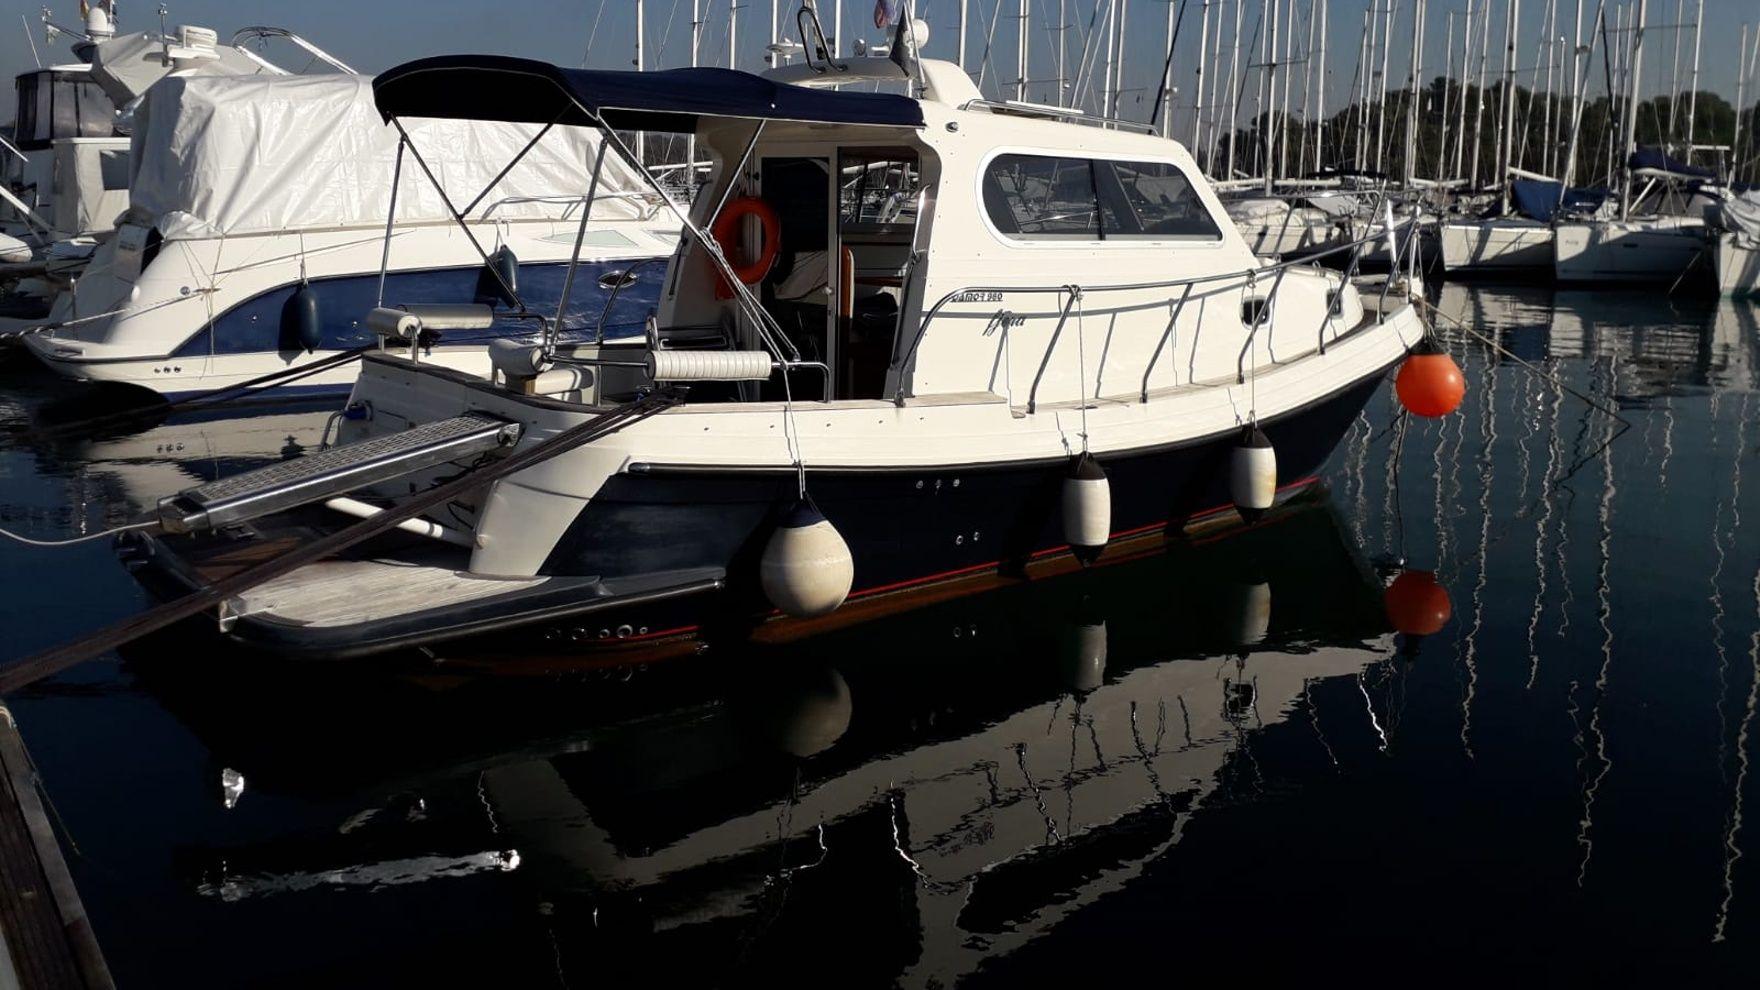 Practical IYT Bareboat Skipper Sail +Power course in Croatia